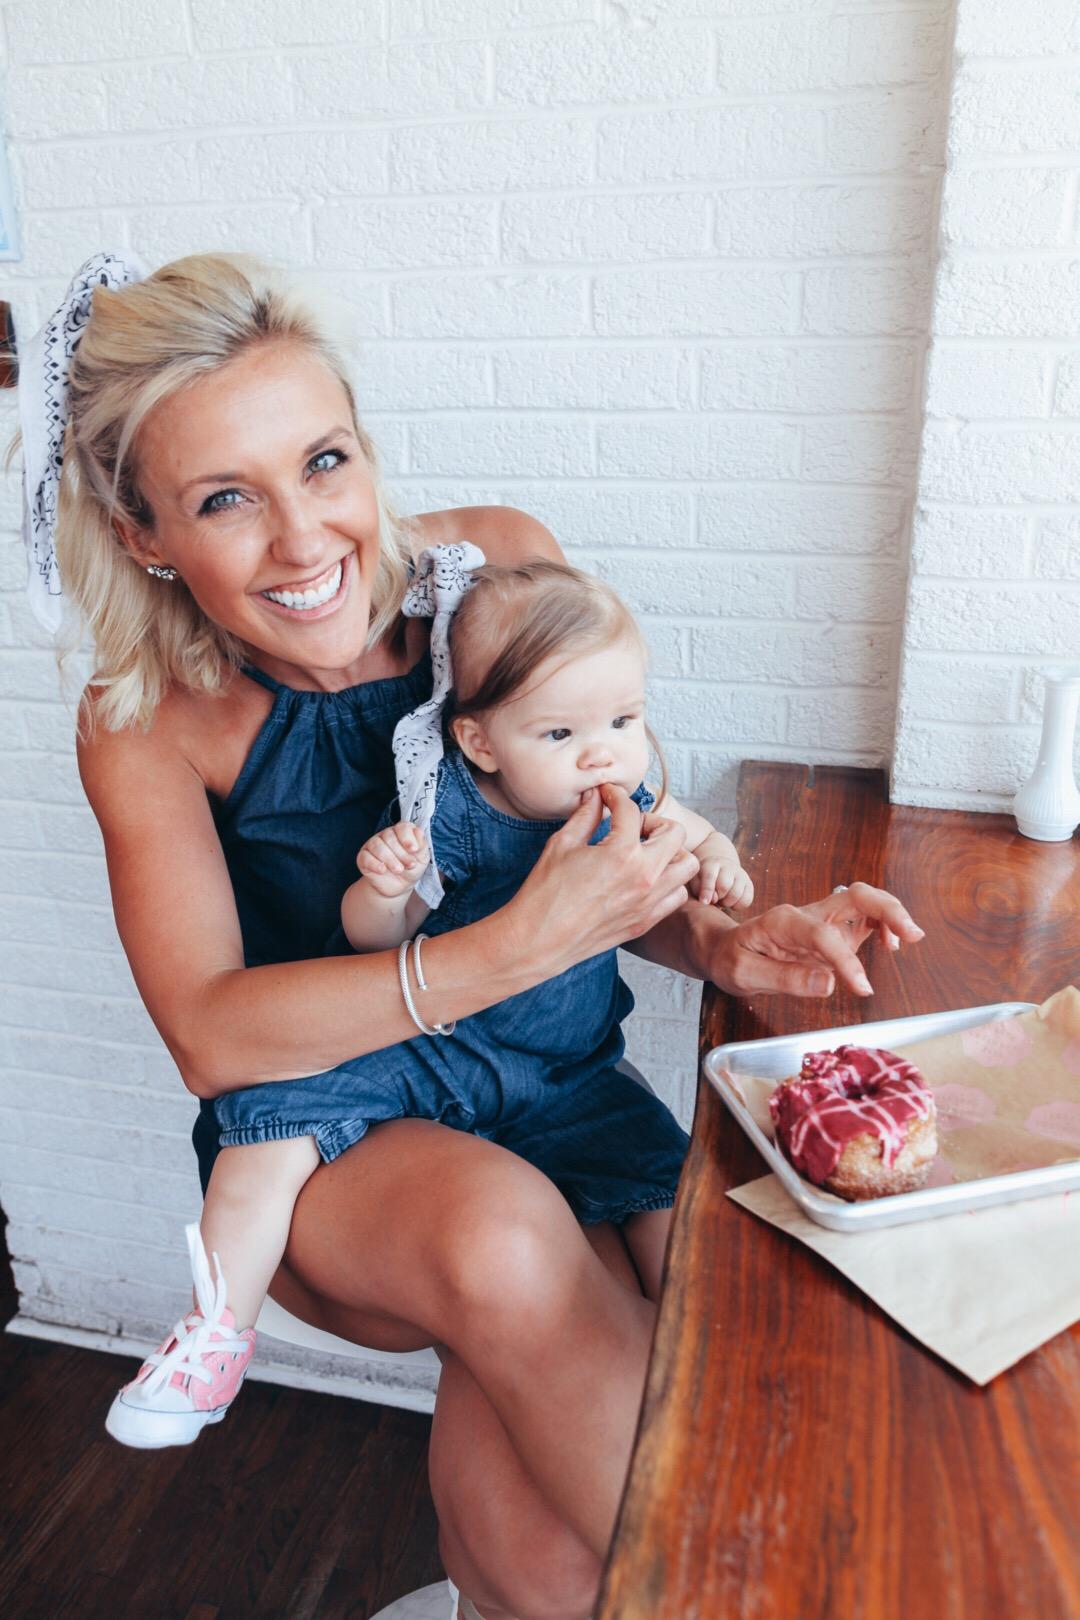 OUTFIT DETAILS:  My Romper  | Bandana  |  Earrings  |  Bracelet |  Bracelet  |  Wedges  |  Sophie Outfit  |  Baby Converses